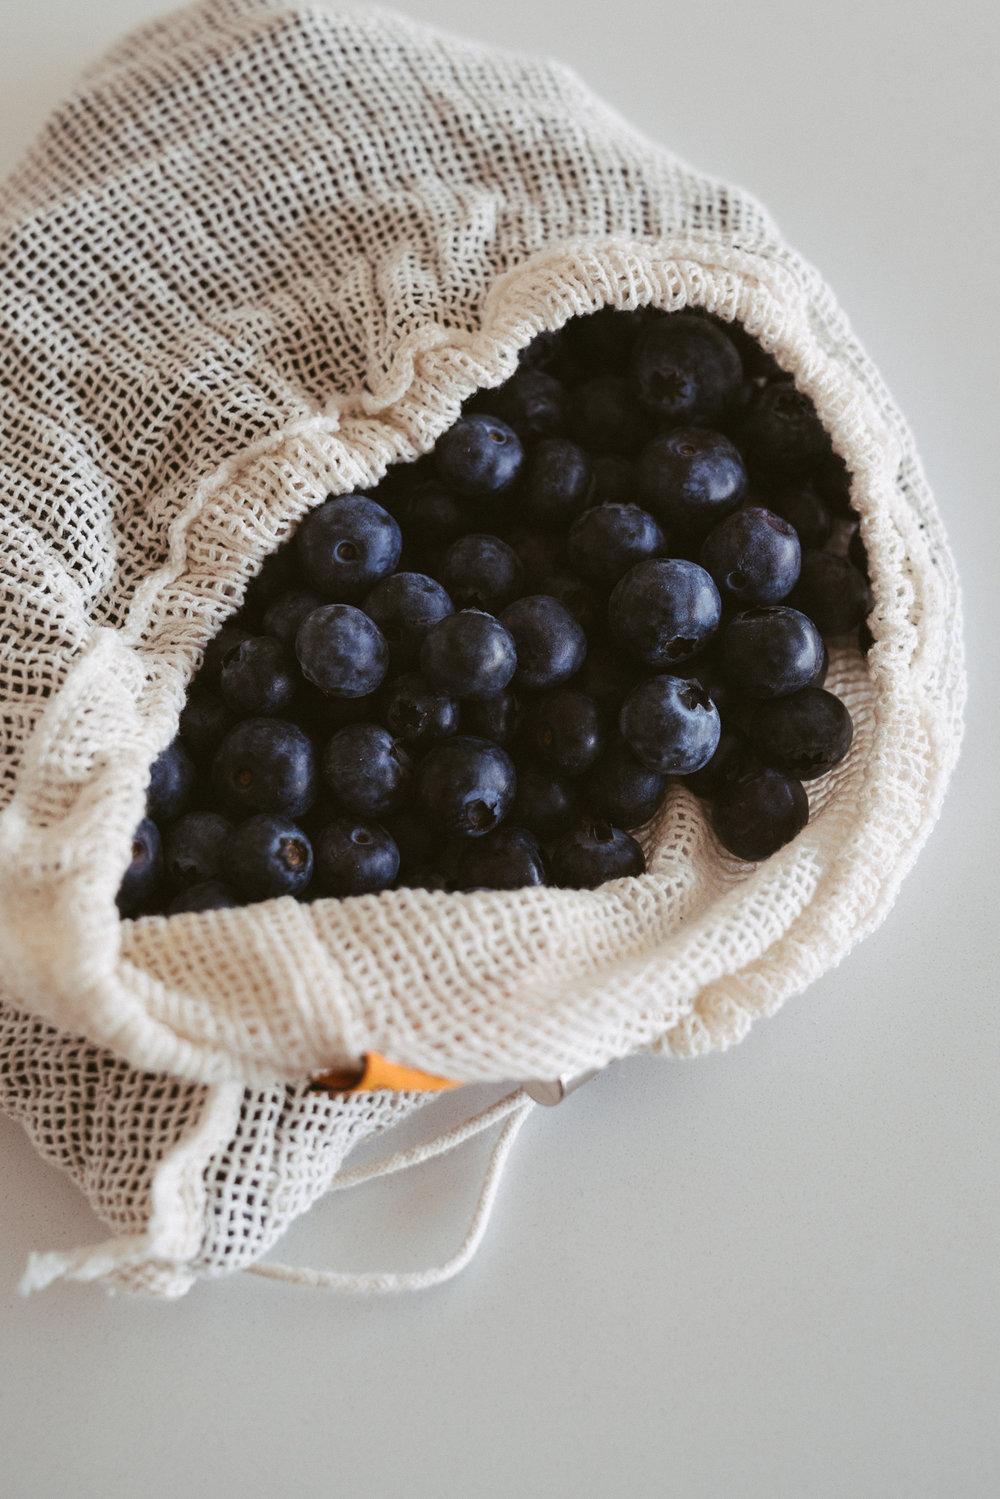 mango_passionfruit_chia_and_yoghurt_jars-2.jpg